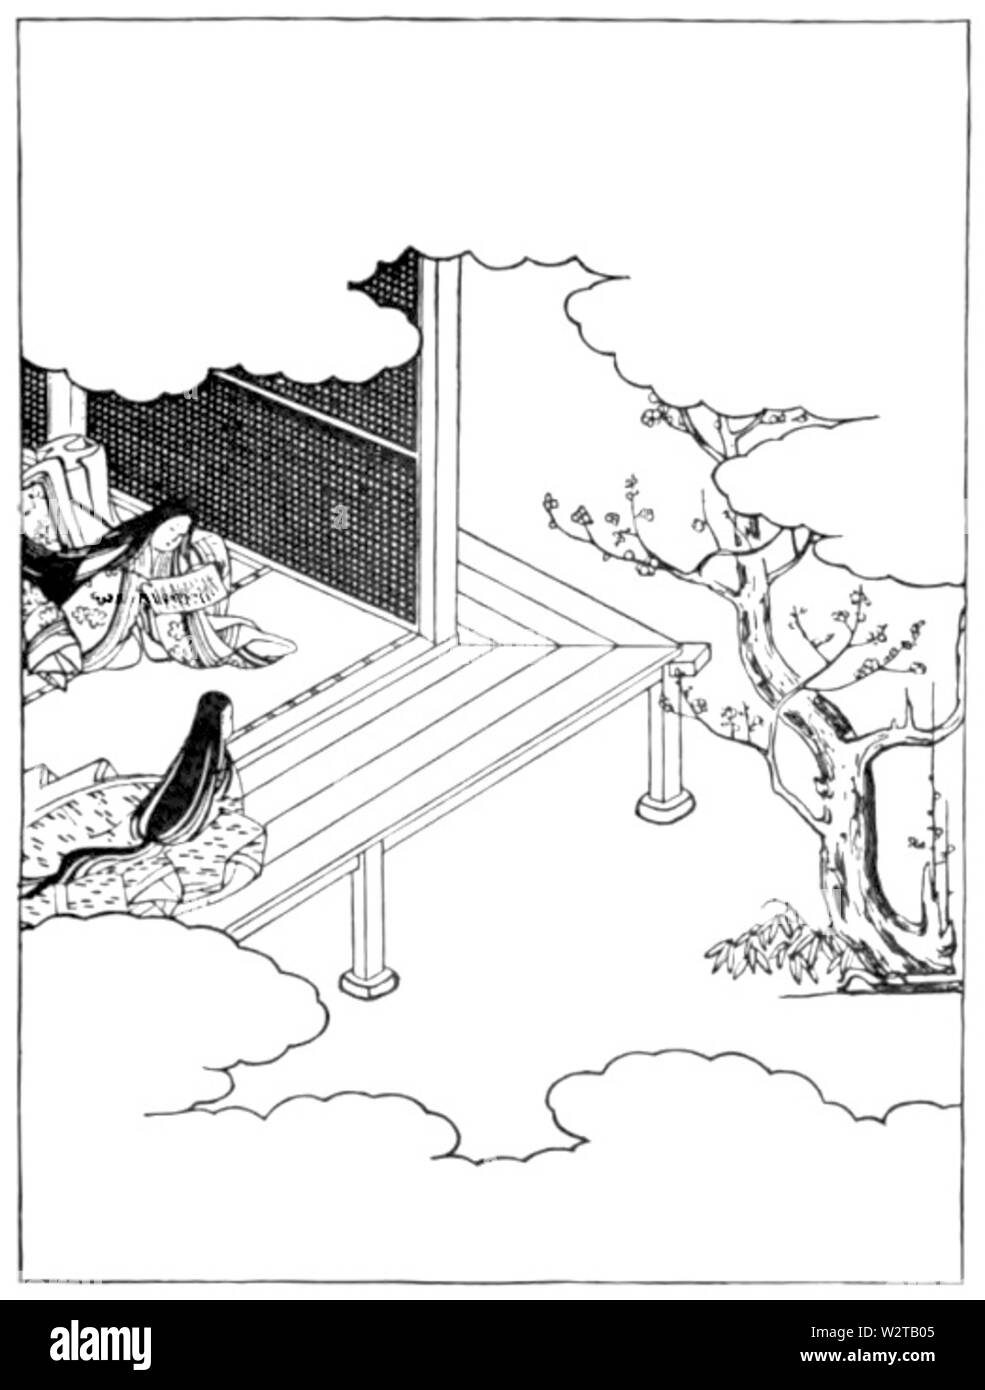 Diaries of Court Ladies of Old Japan 053 - Stock Image